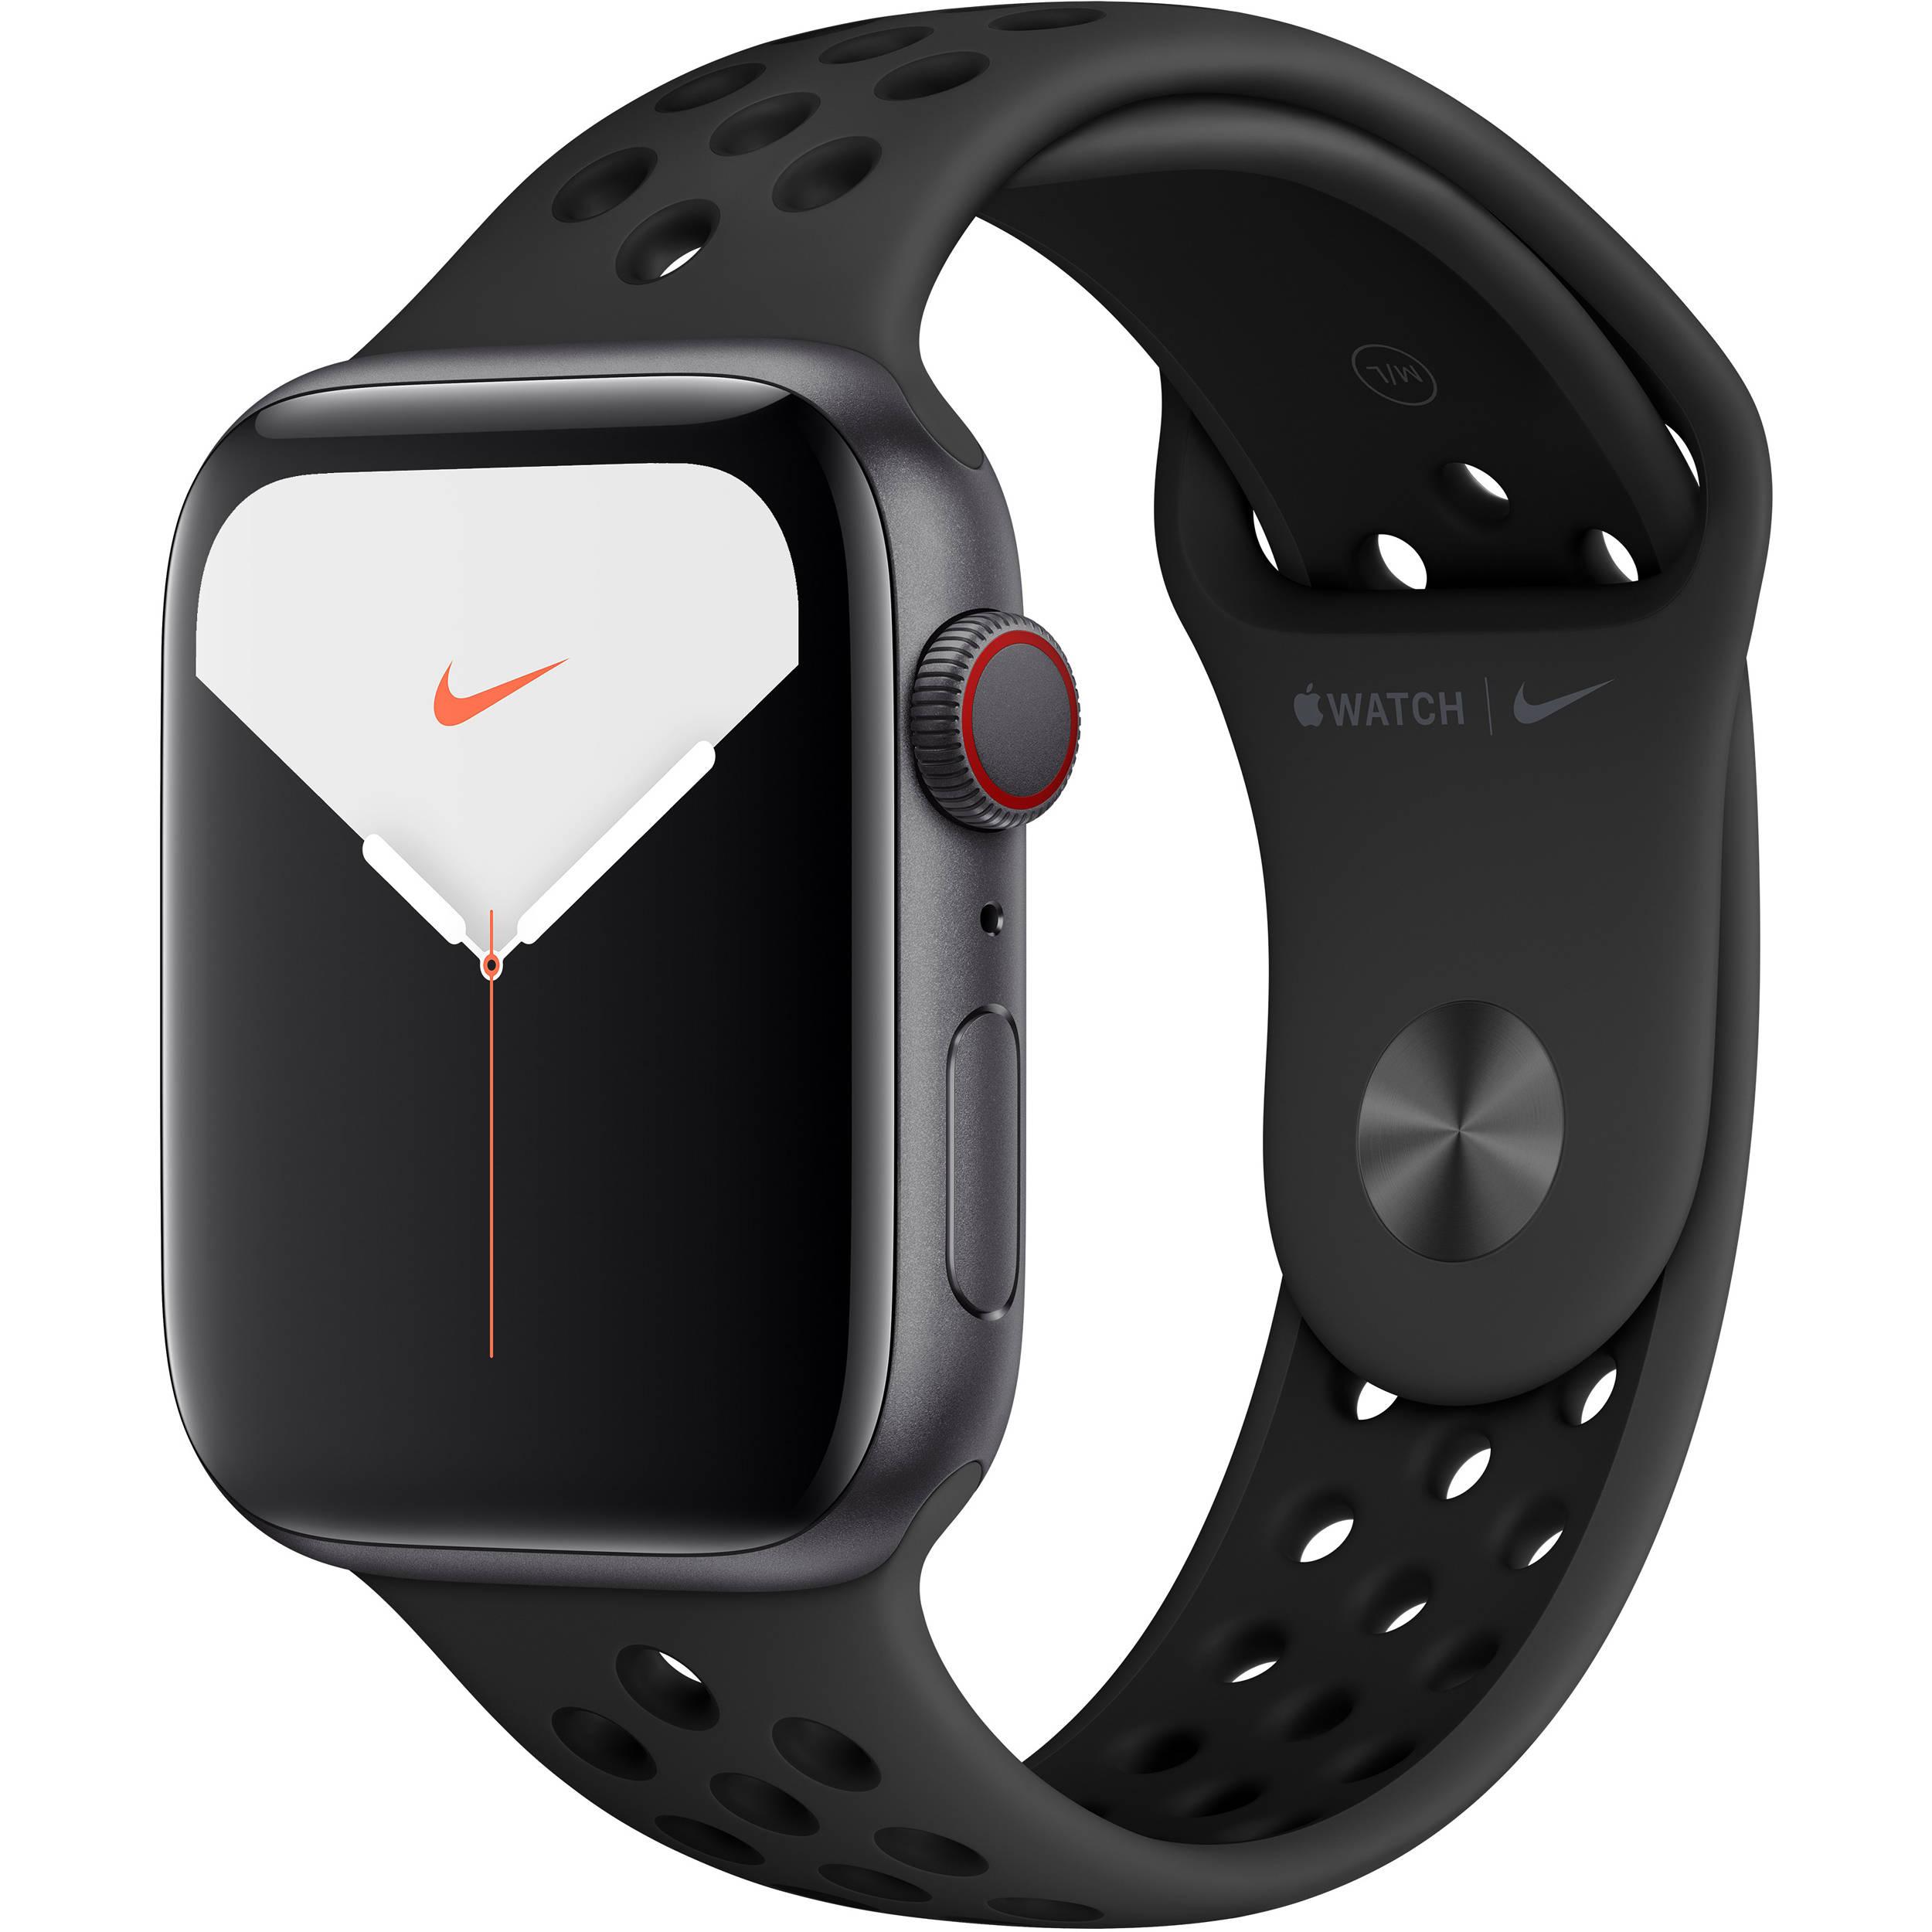 Apple Watch Series 5 MX3A2LL/A B&H Photo Video